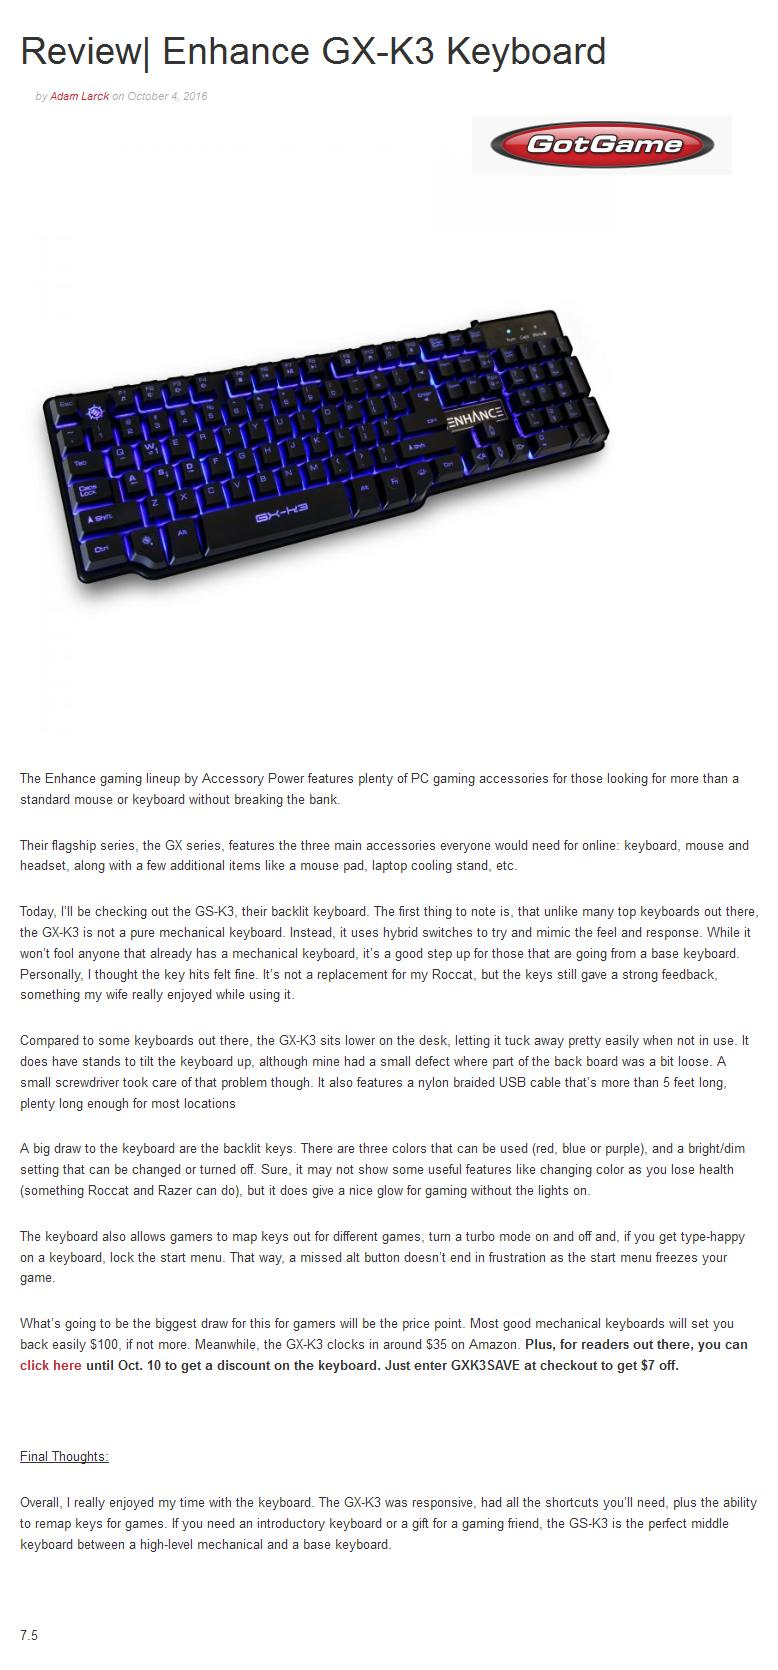 gotgame-enhance-gx-k3-keyboard